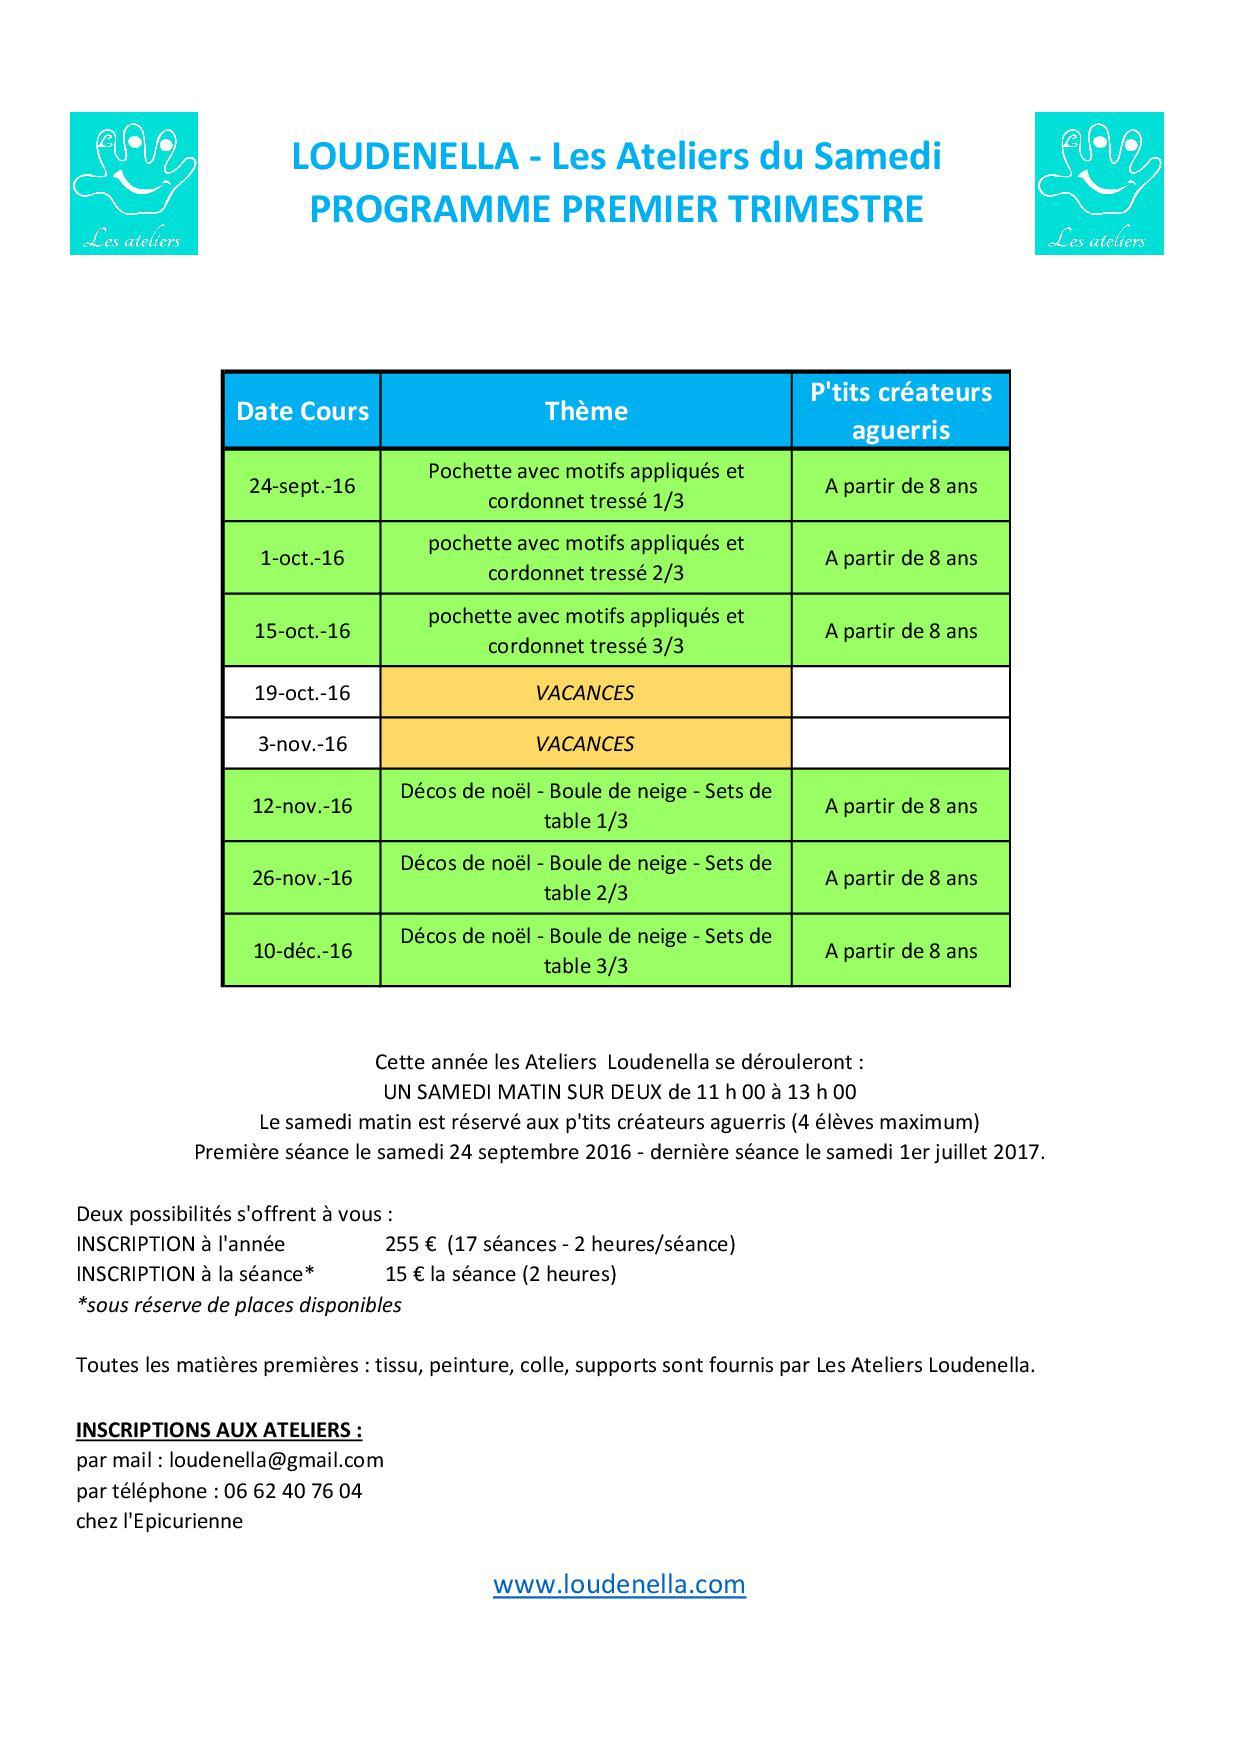 programme-loudenella-ateliers-samedi-sept-dec-16